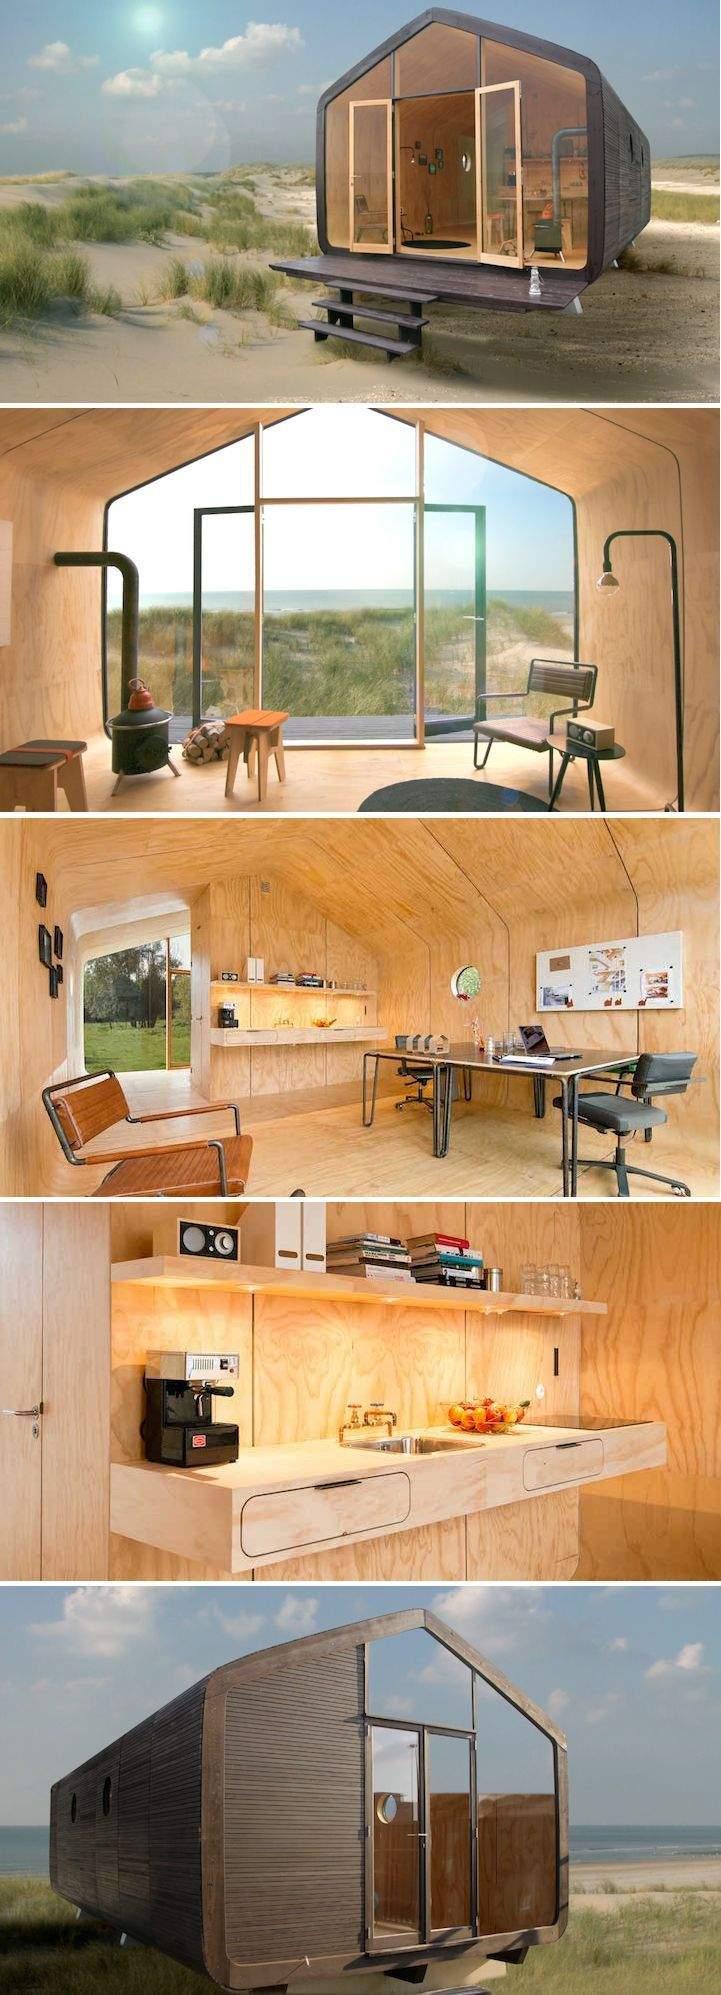 fb7622e92fb411b3964bd f9b81c build my own house tinyhouses